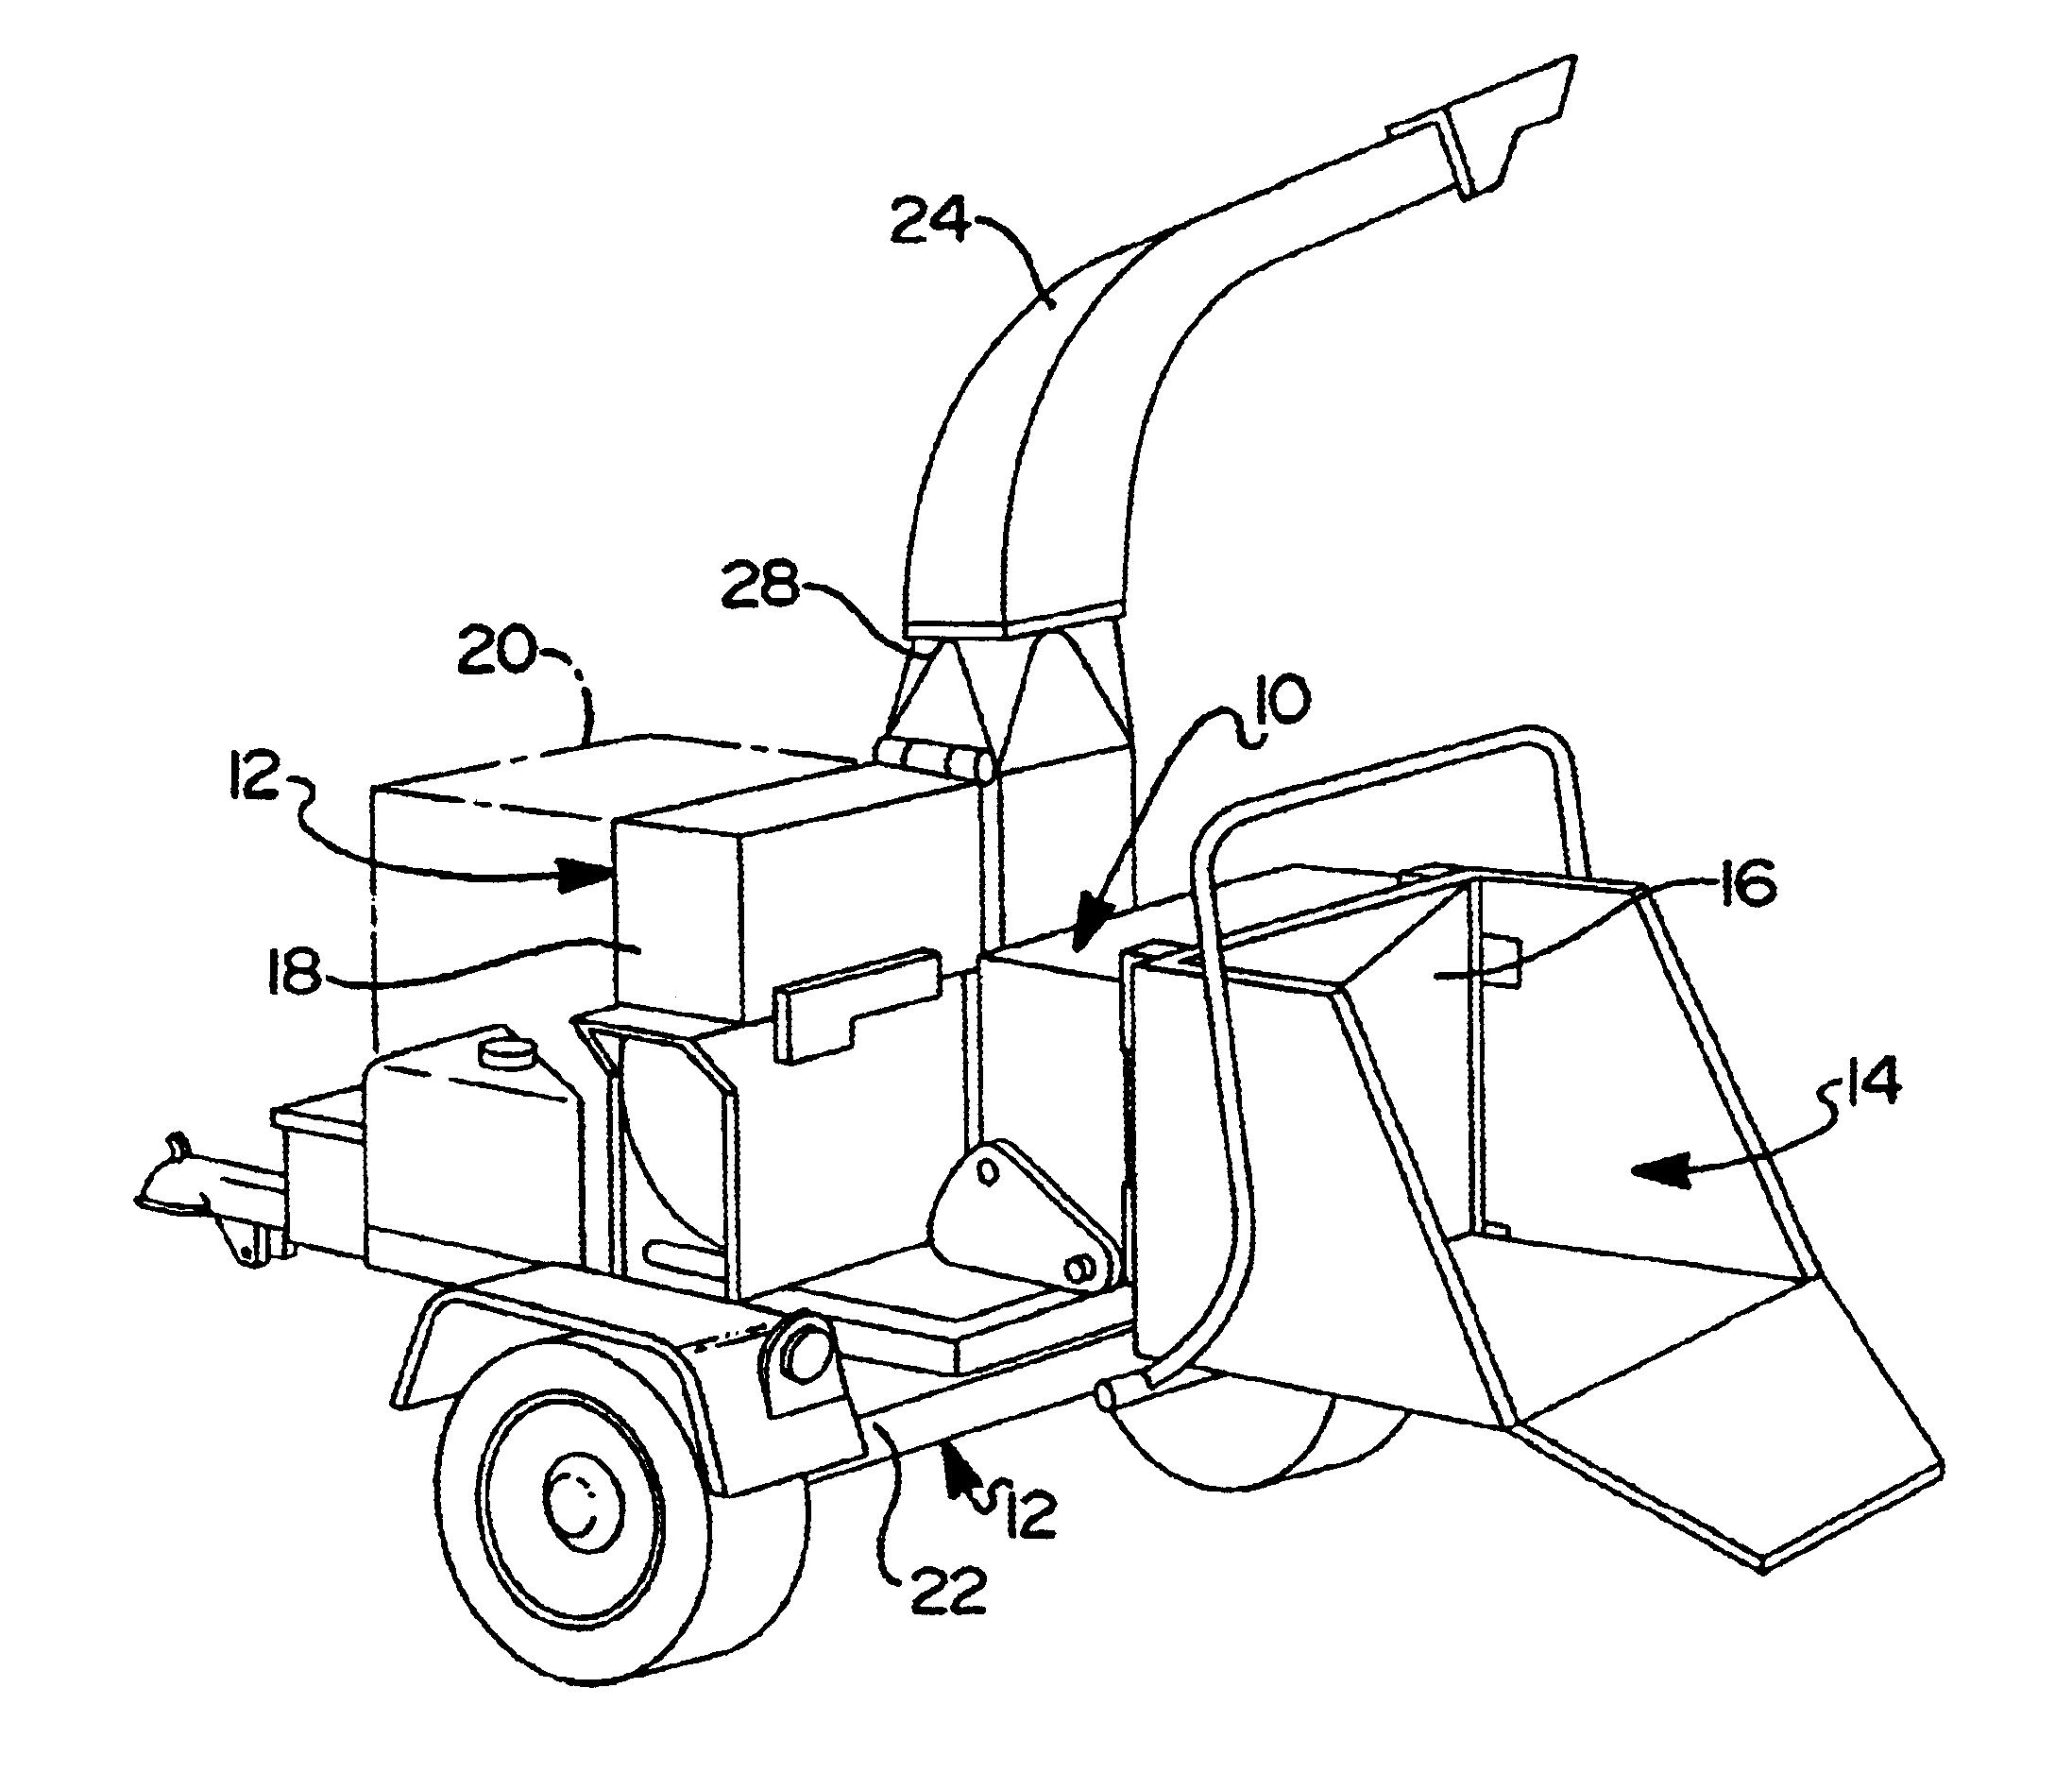 Kawasaki bayou 300 wiring diagram images wiring diagram